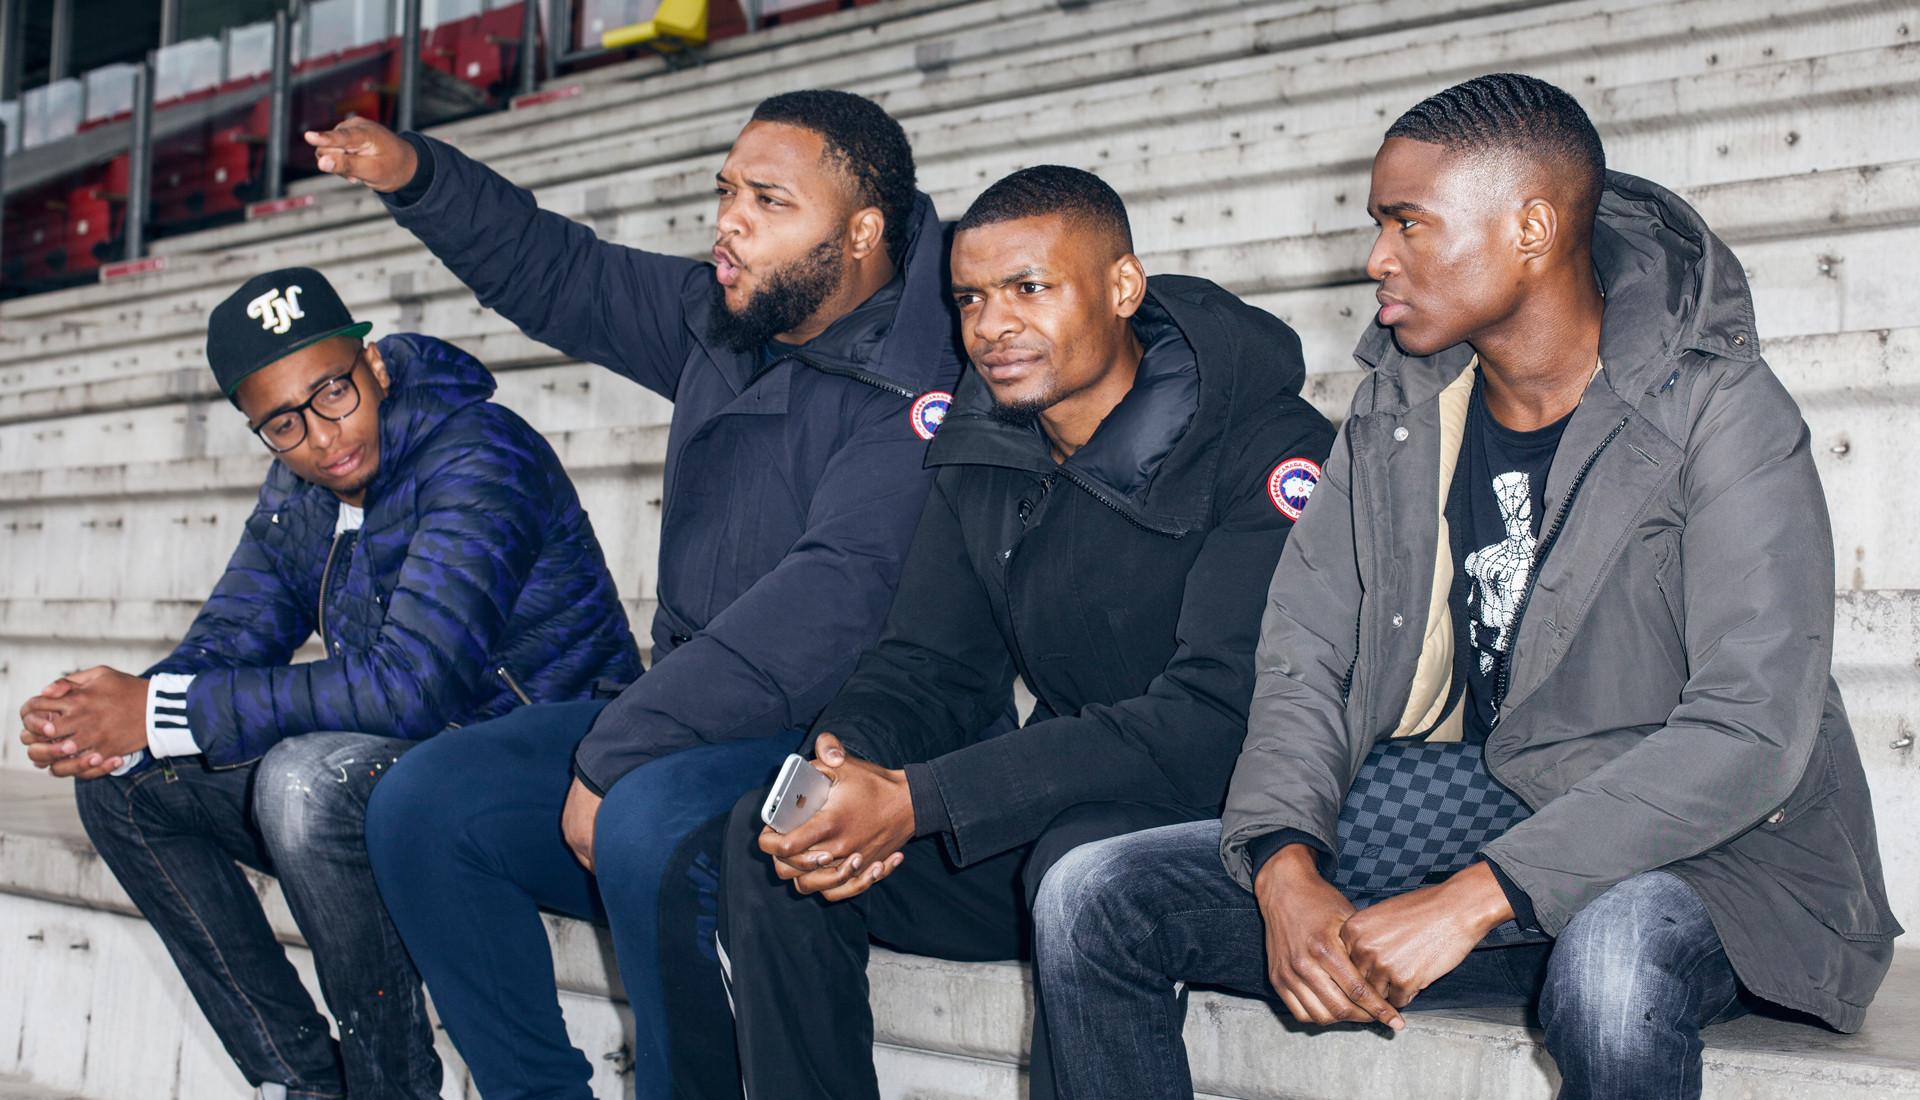 Hoe rapgroep Broederliefde elkaar overeind hield en nu op nummer 1 staat